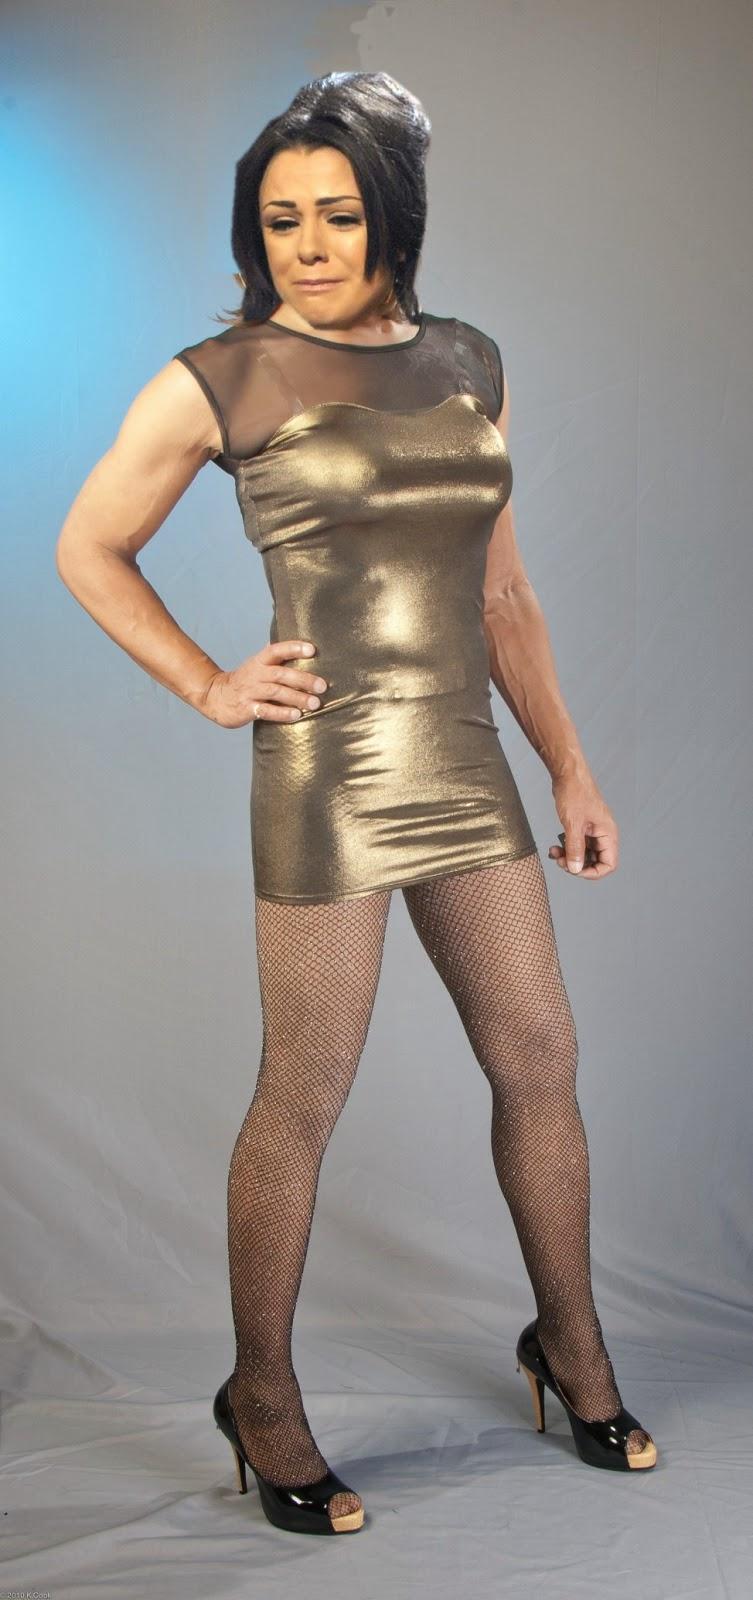 Celebrity Transvestite Fakes Sian Lloyd